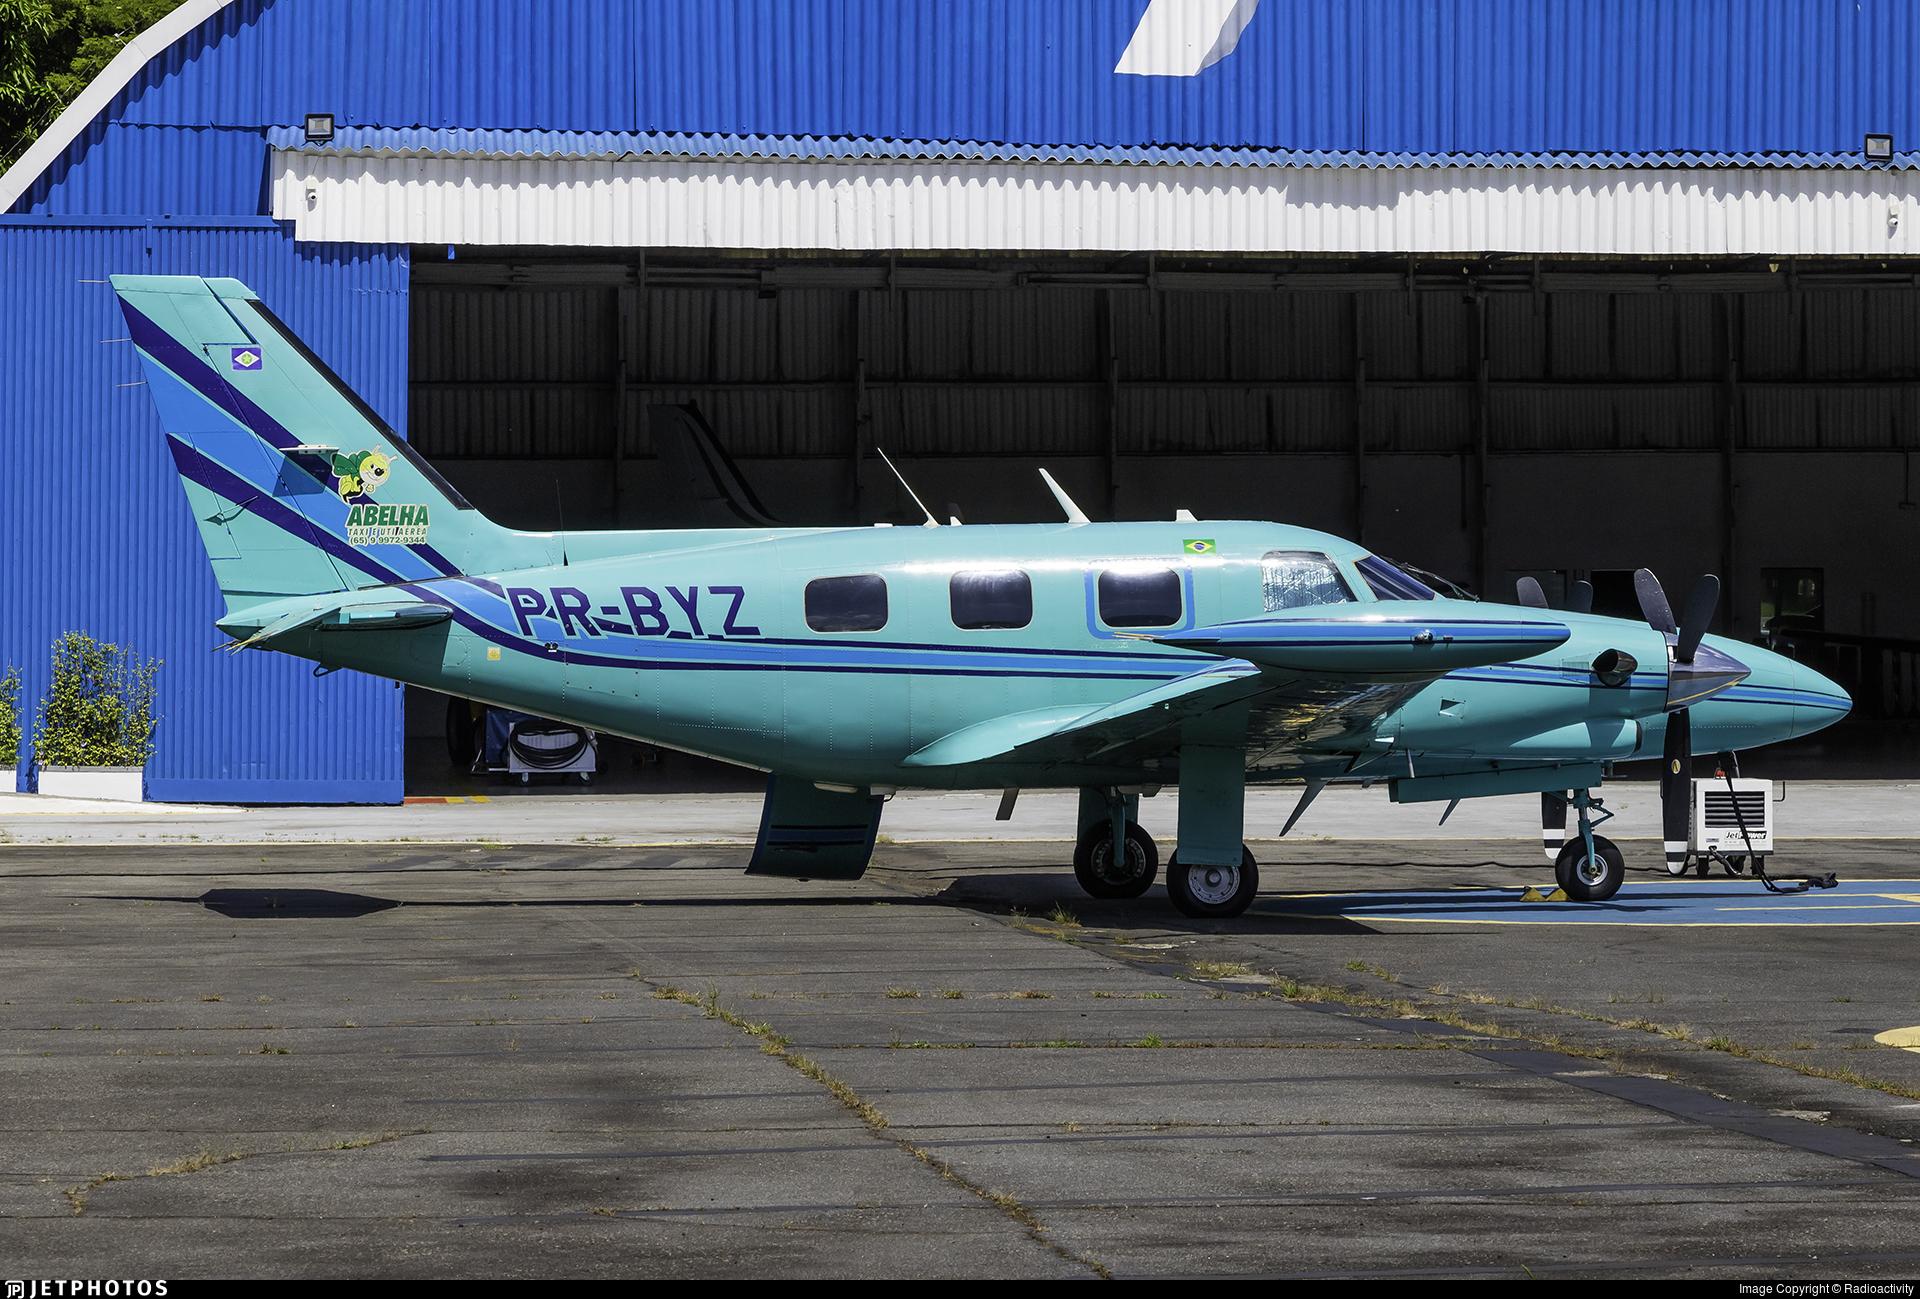 PR-BYZ - Piper PA-31T1 Cheyenne I - Abelha Taxi Aéreo e UTI